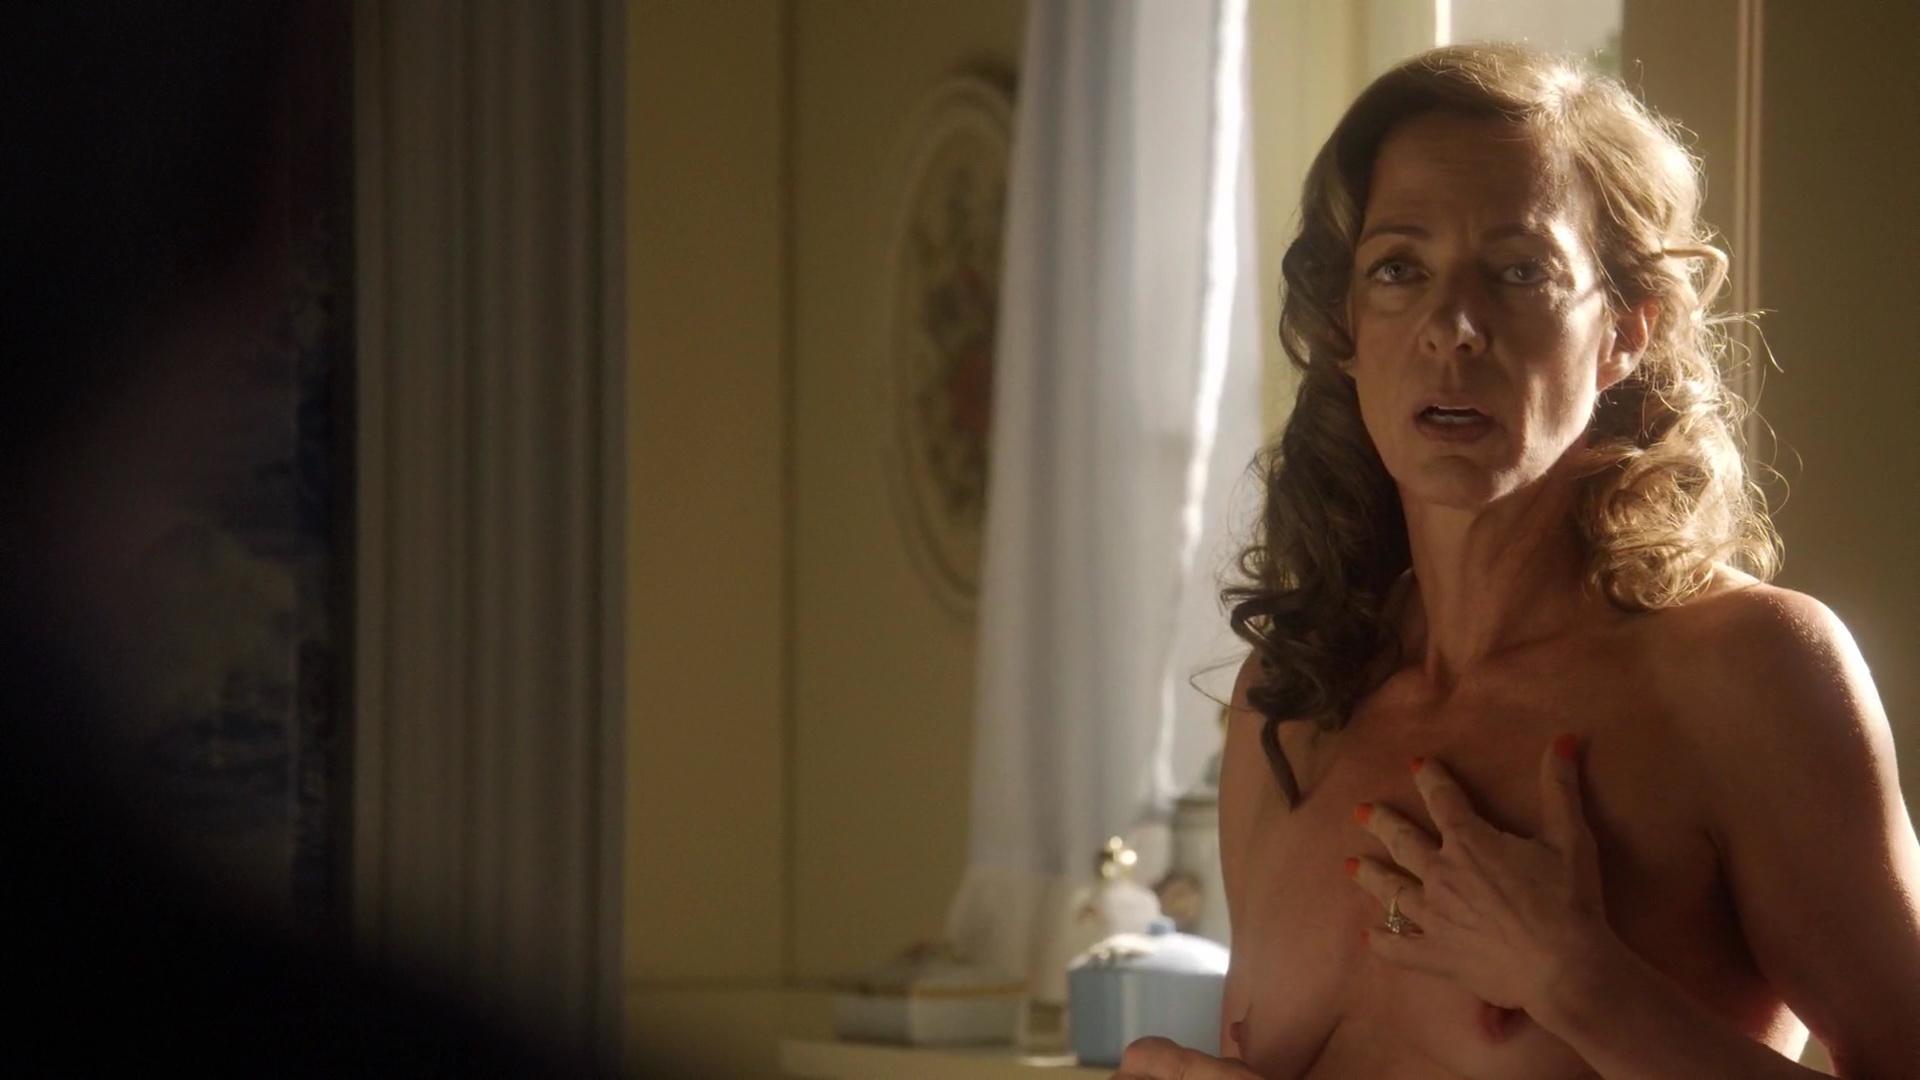 Jenifer hudson all nude having sex